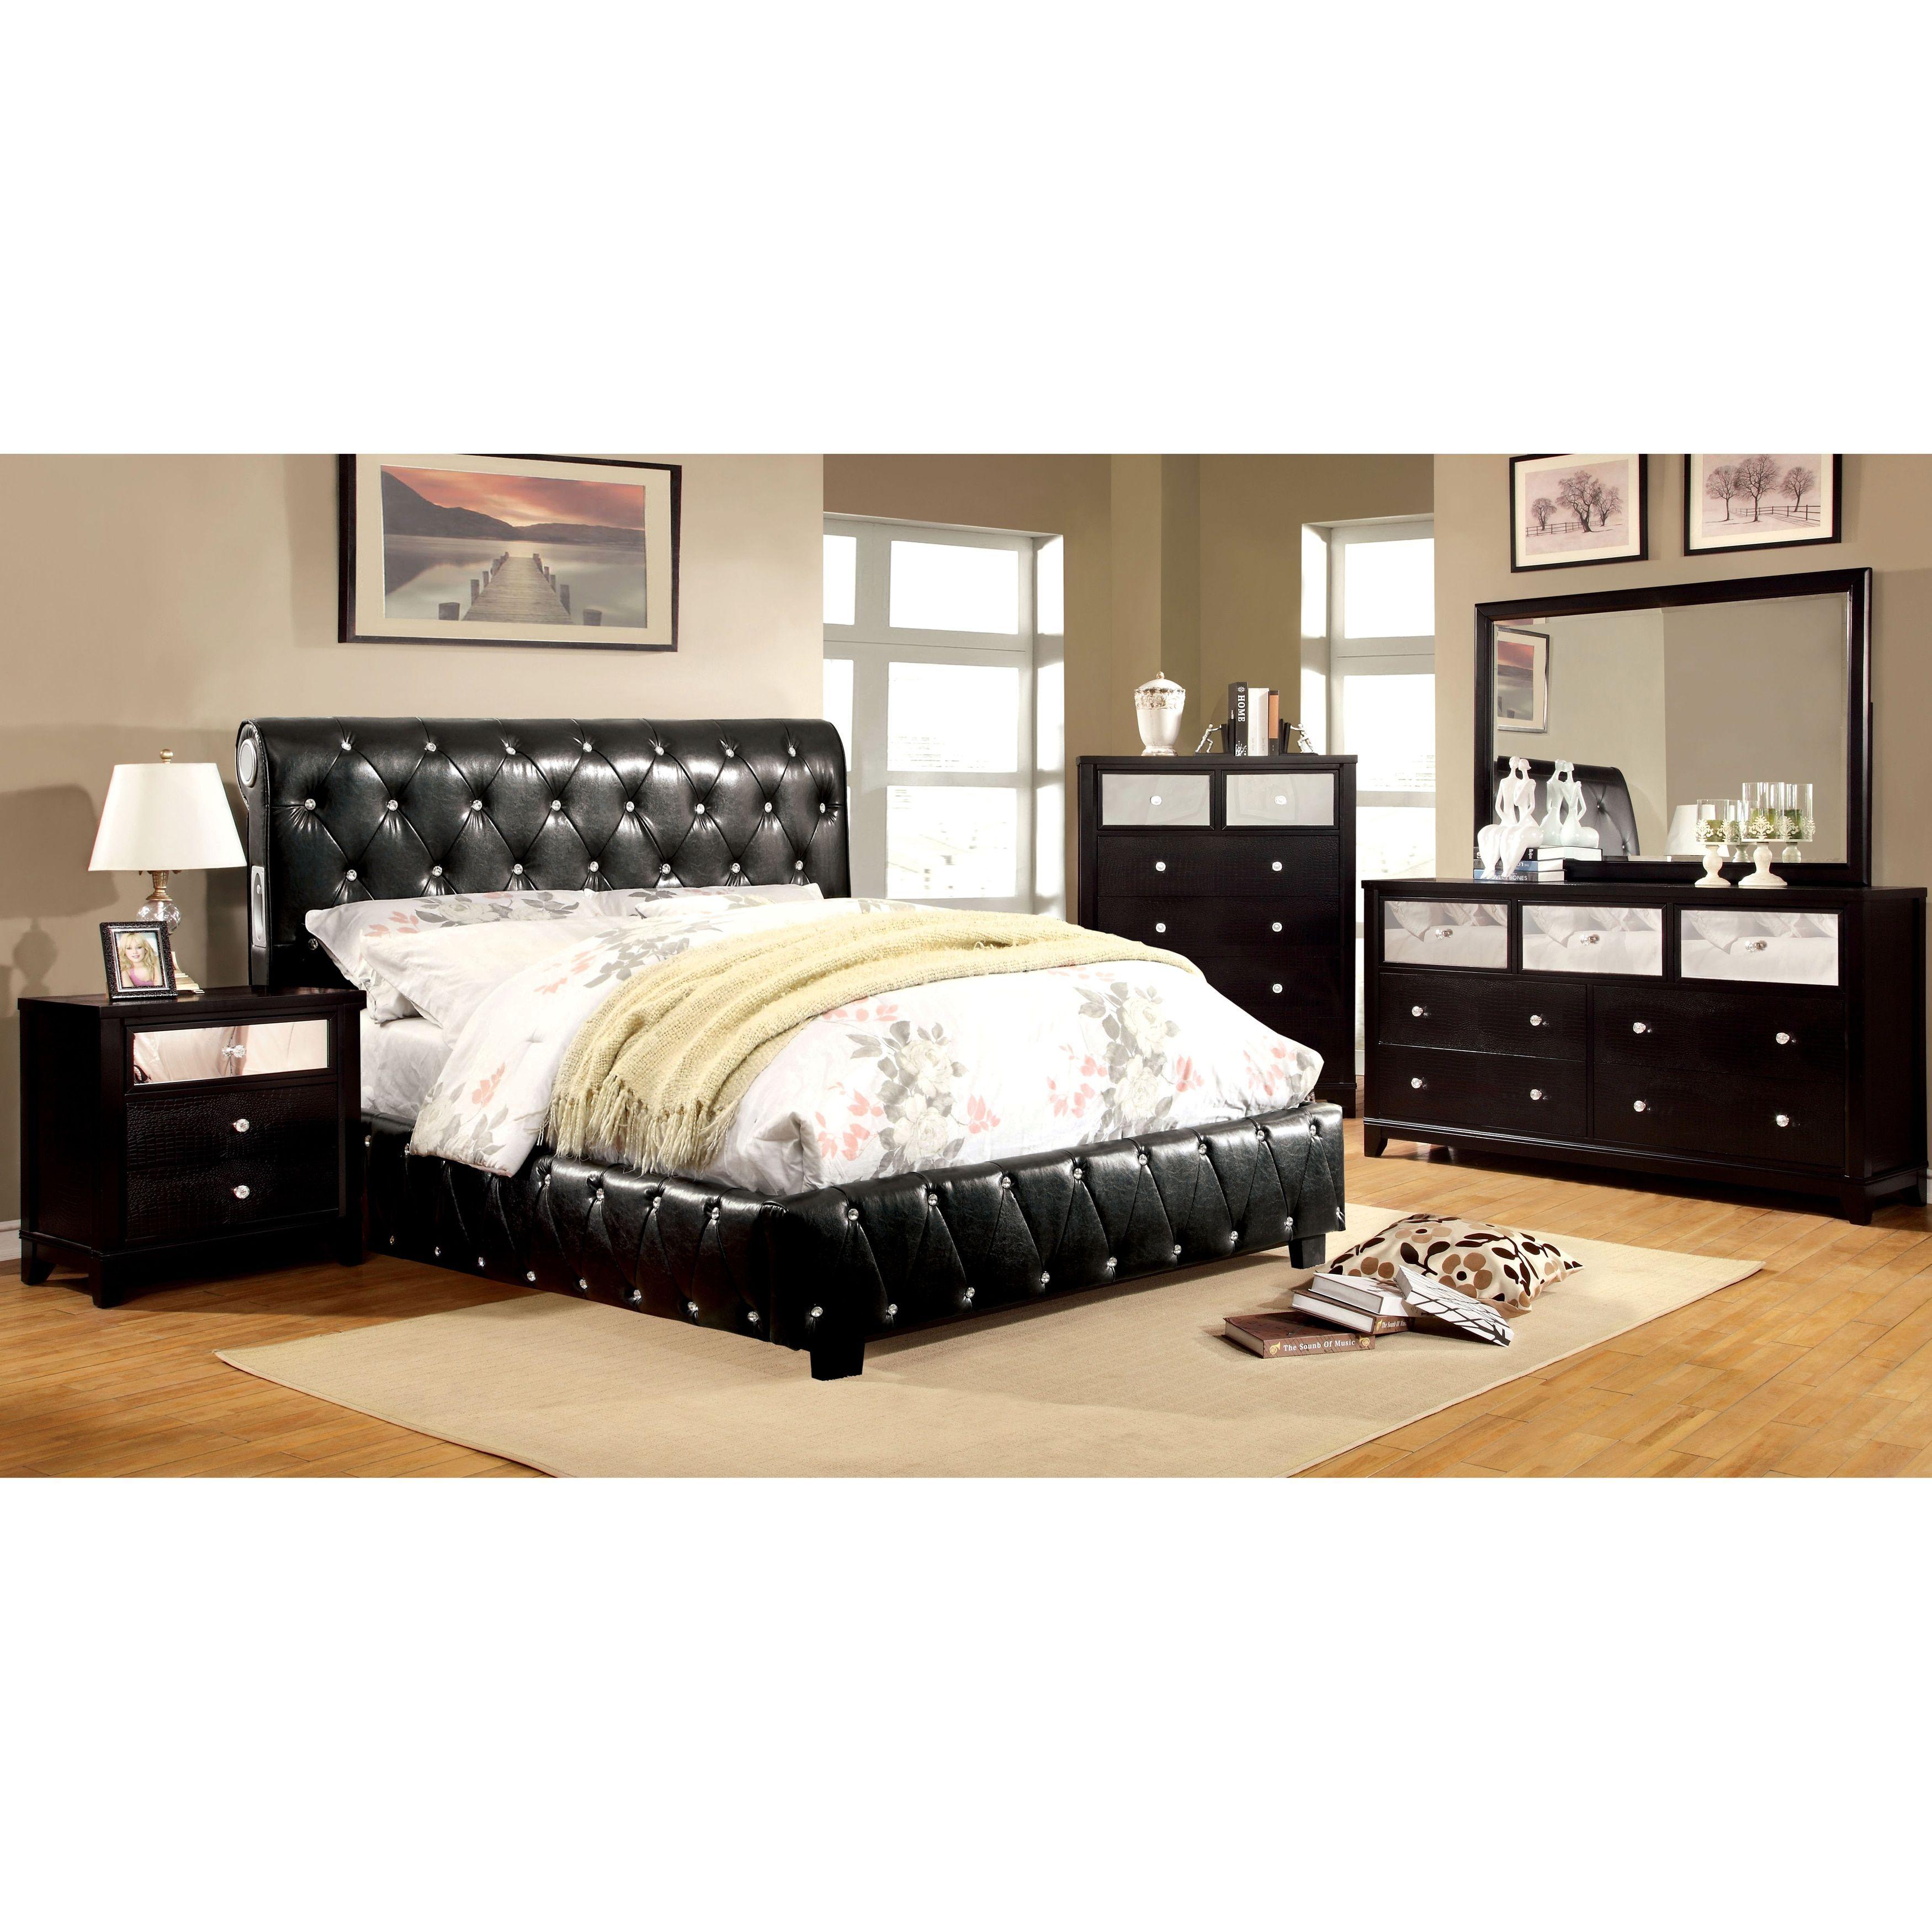 Furniture of America Emmaline Black 4-Piece Bluetooth Bedroom Set ...